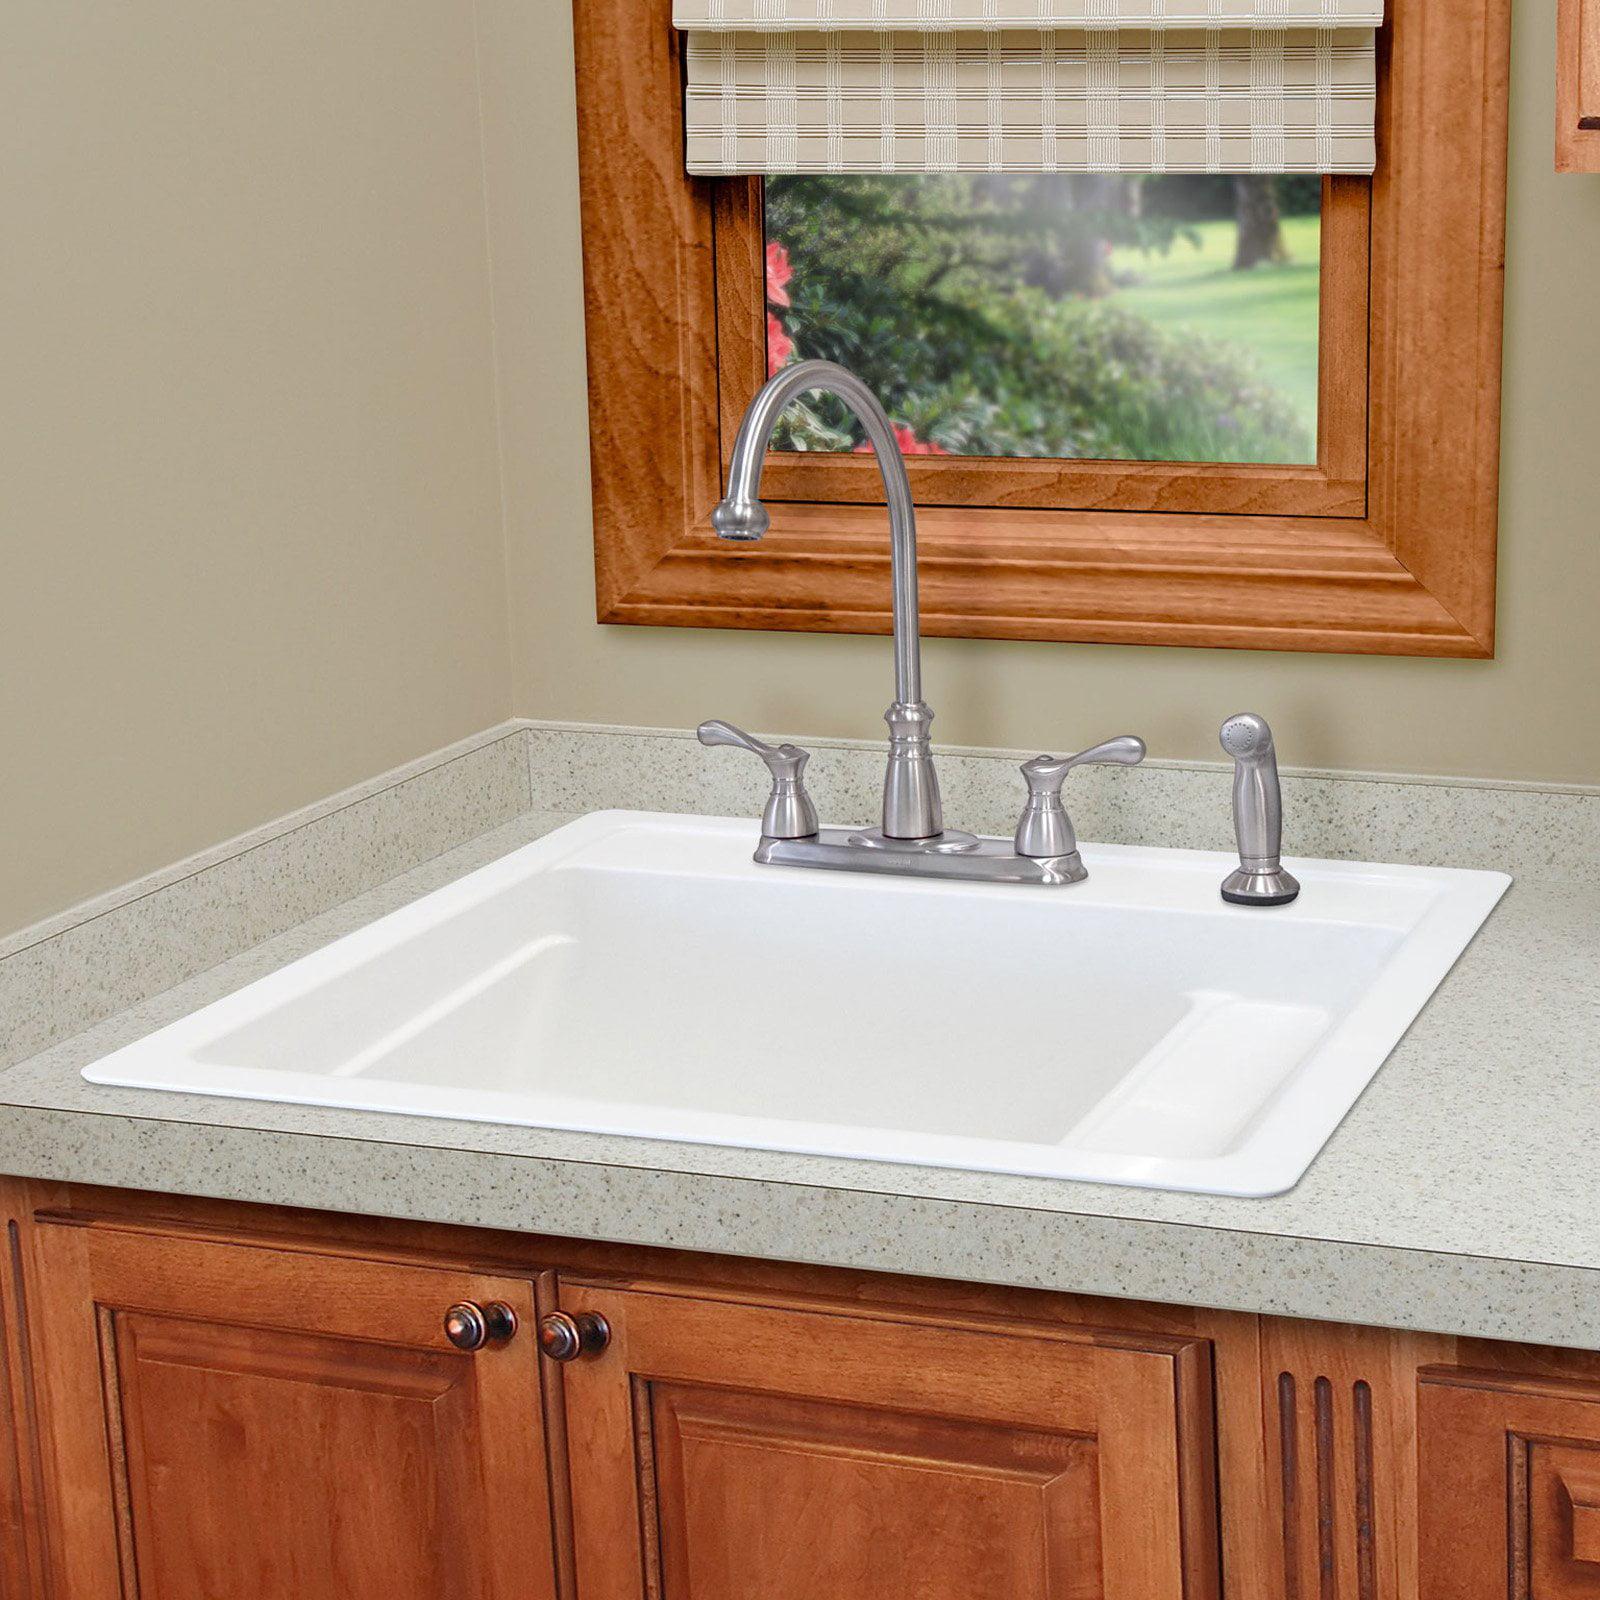 Mustee Vector 25 Single Basin Drop In Utility Sink